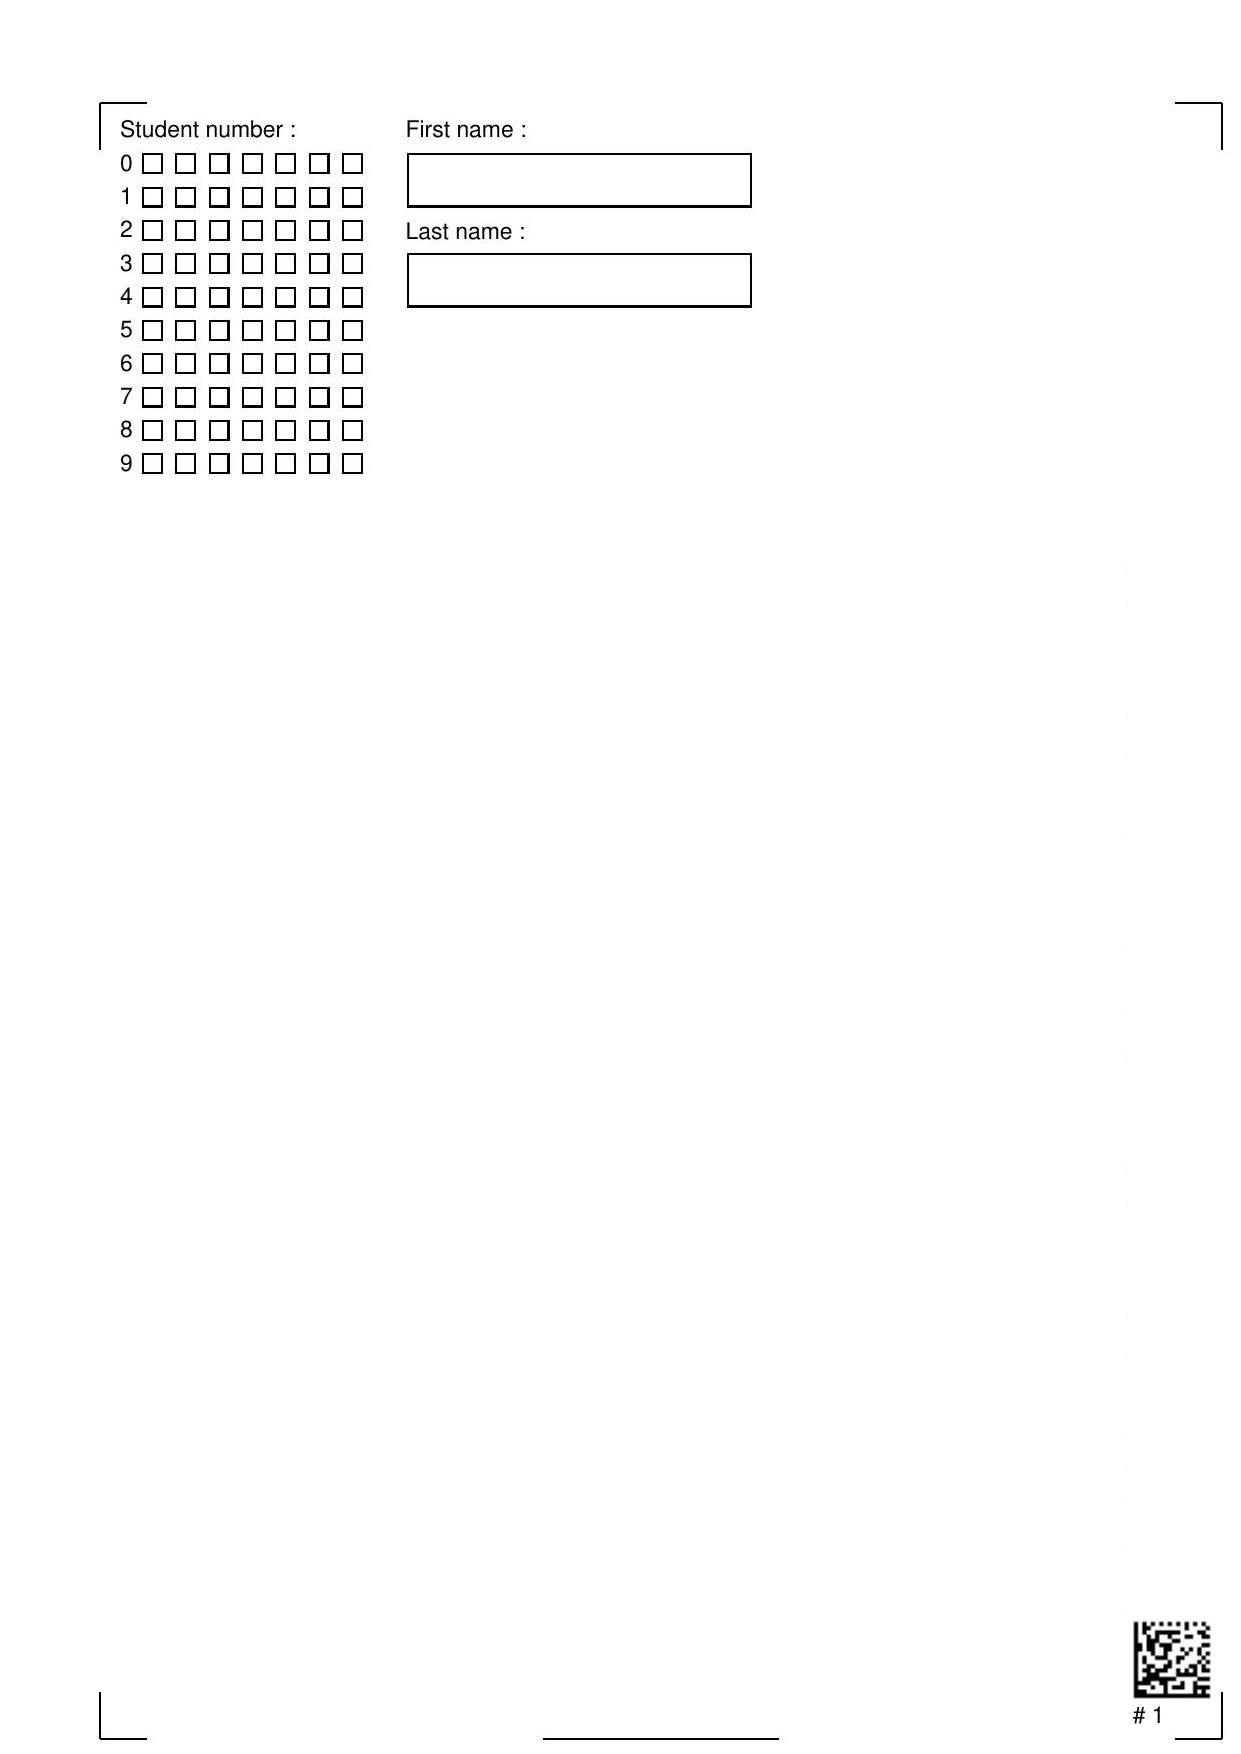 tests/data/scanned_pdfs/tilted.jpg